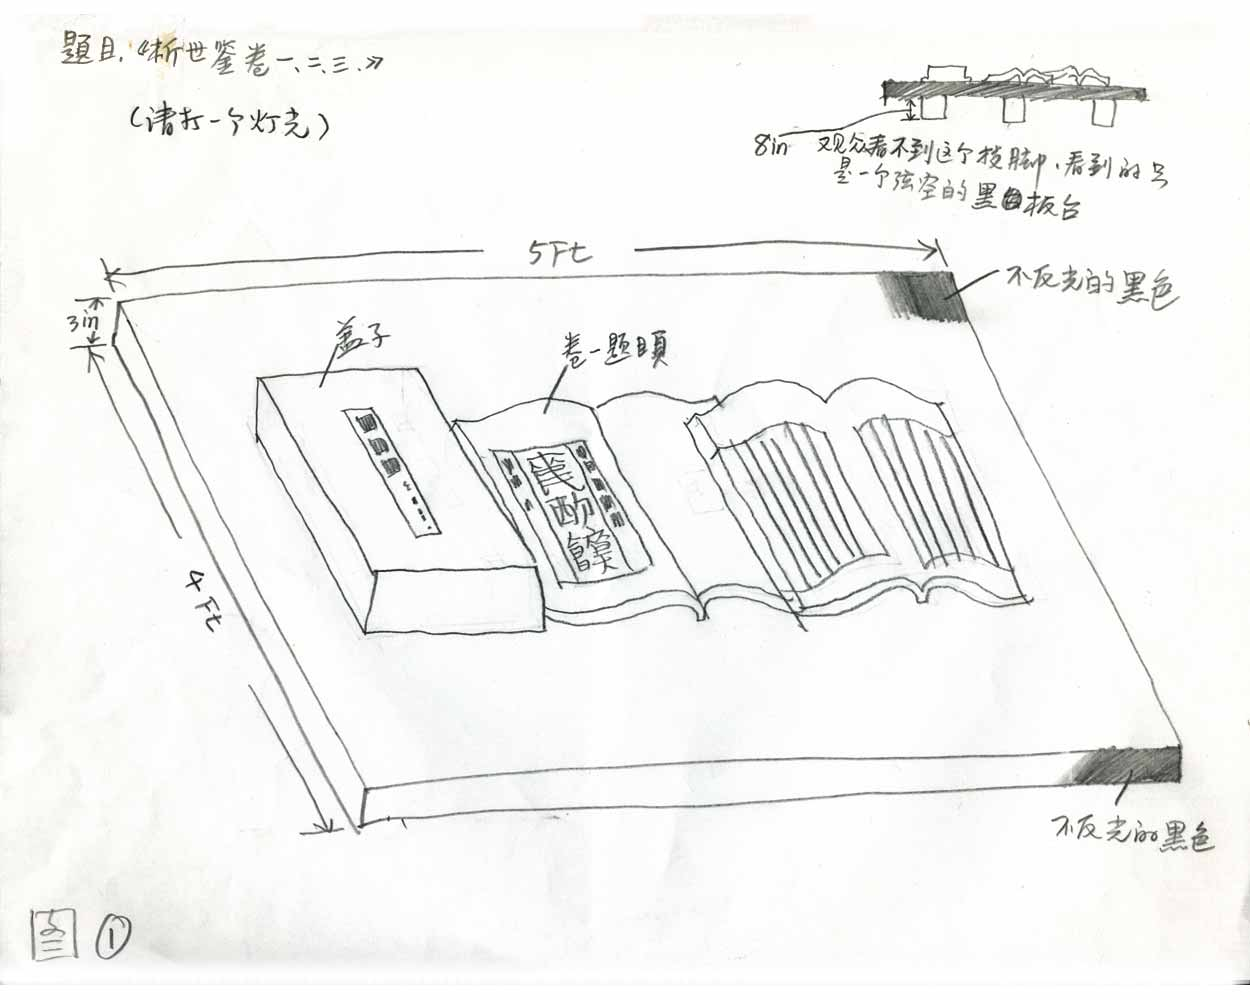 Bing Xu's project plan, pg 1